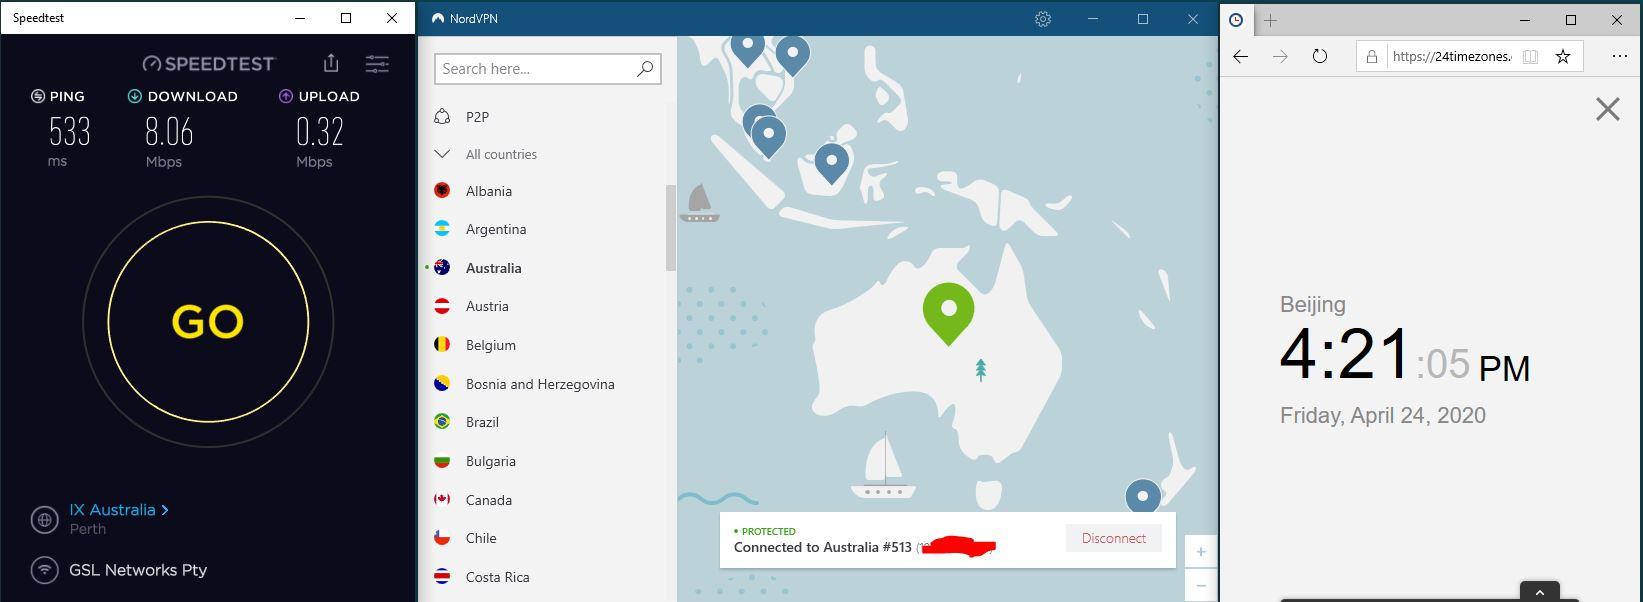 Windows10 NordVPN Australia #513 中国VPN 翻墙 科学上网 SpeedTest测速-20200424